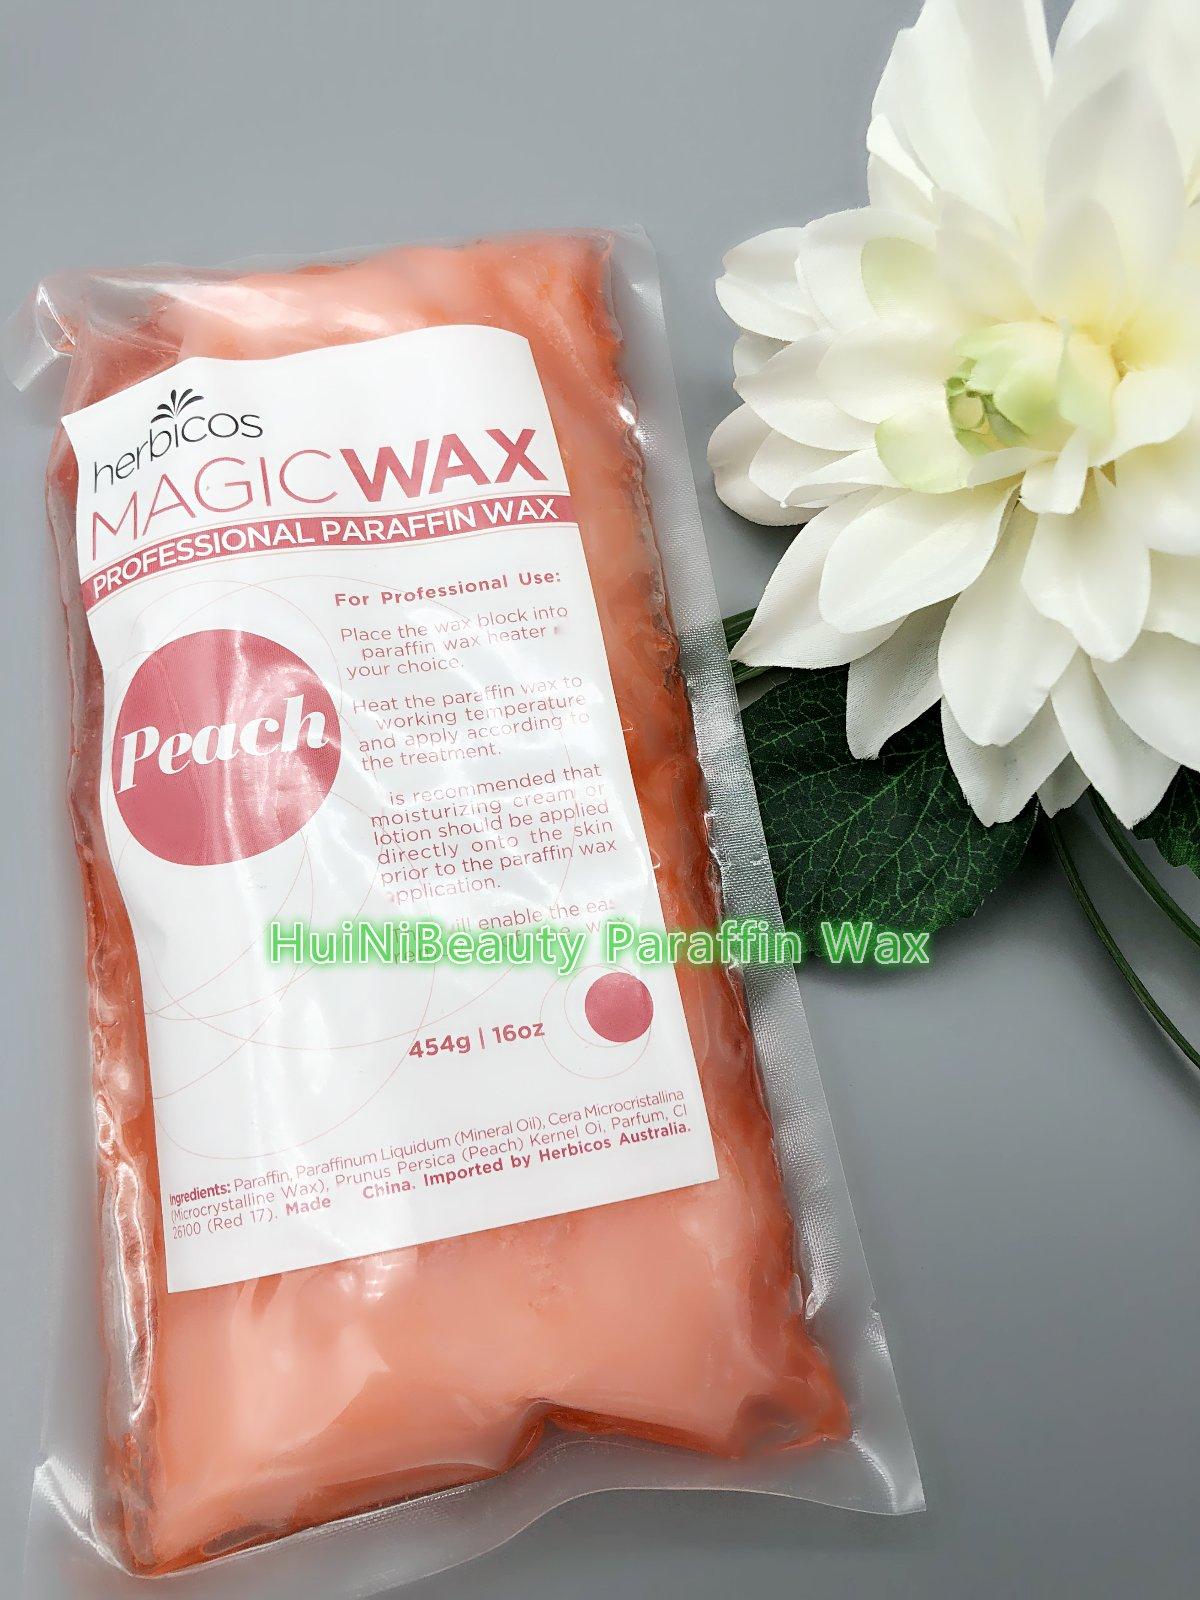 Huini Herbicos Beauty Antibacterial Paraffin Wax 2 lbs - Paraffin Wax - Peach 1lb/pc X 2 CD-RPW003-1